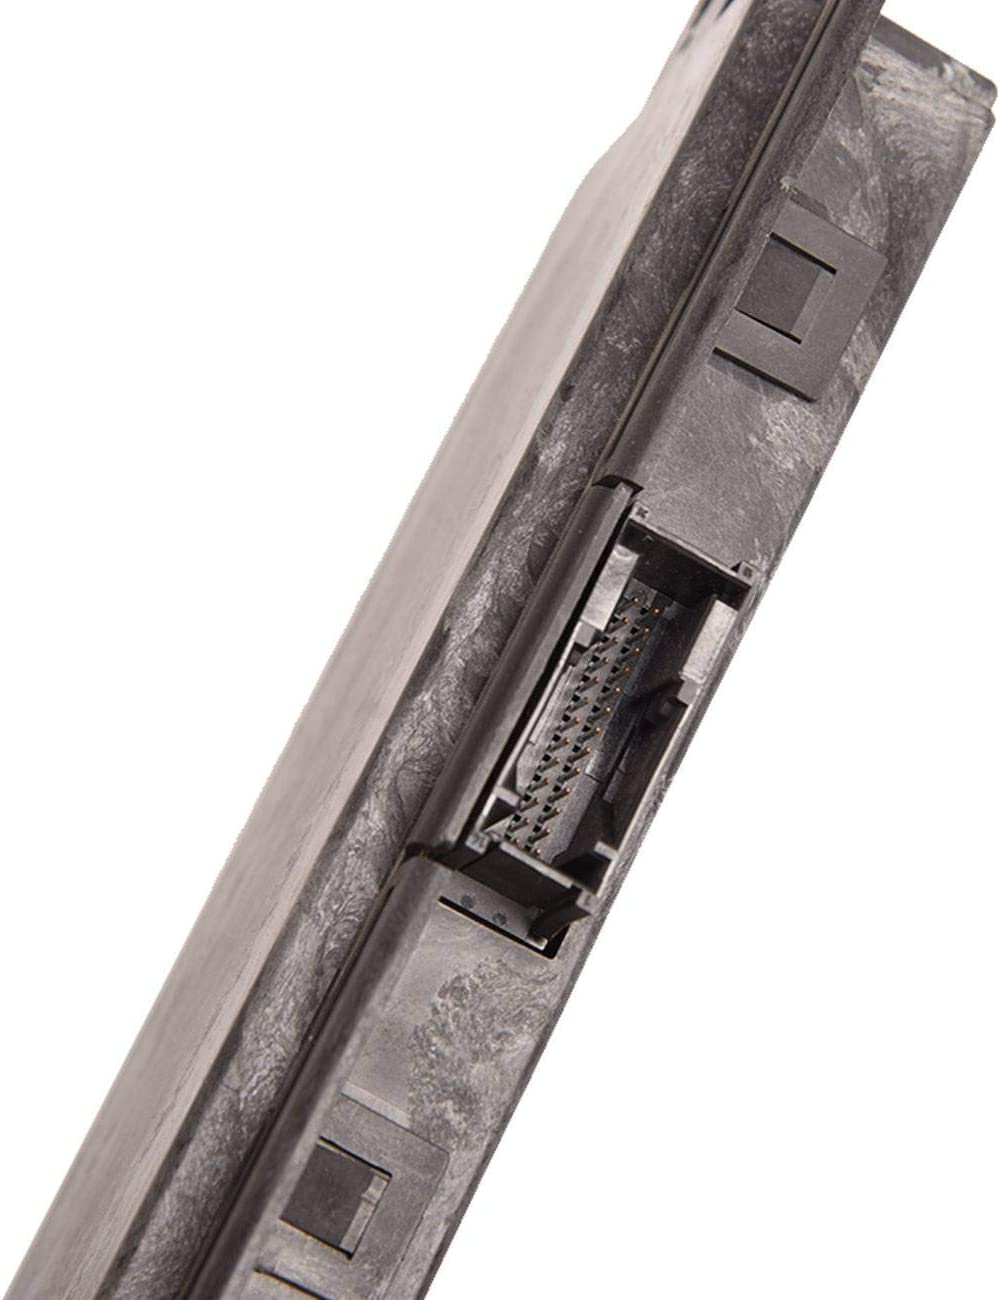 Bapmic 61359249084 61359390491 Control Unit Footwell Module Compatible with BMW E84 E89 E90 E91 E92 E93